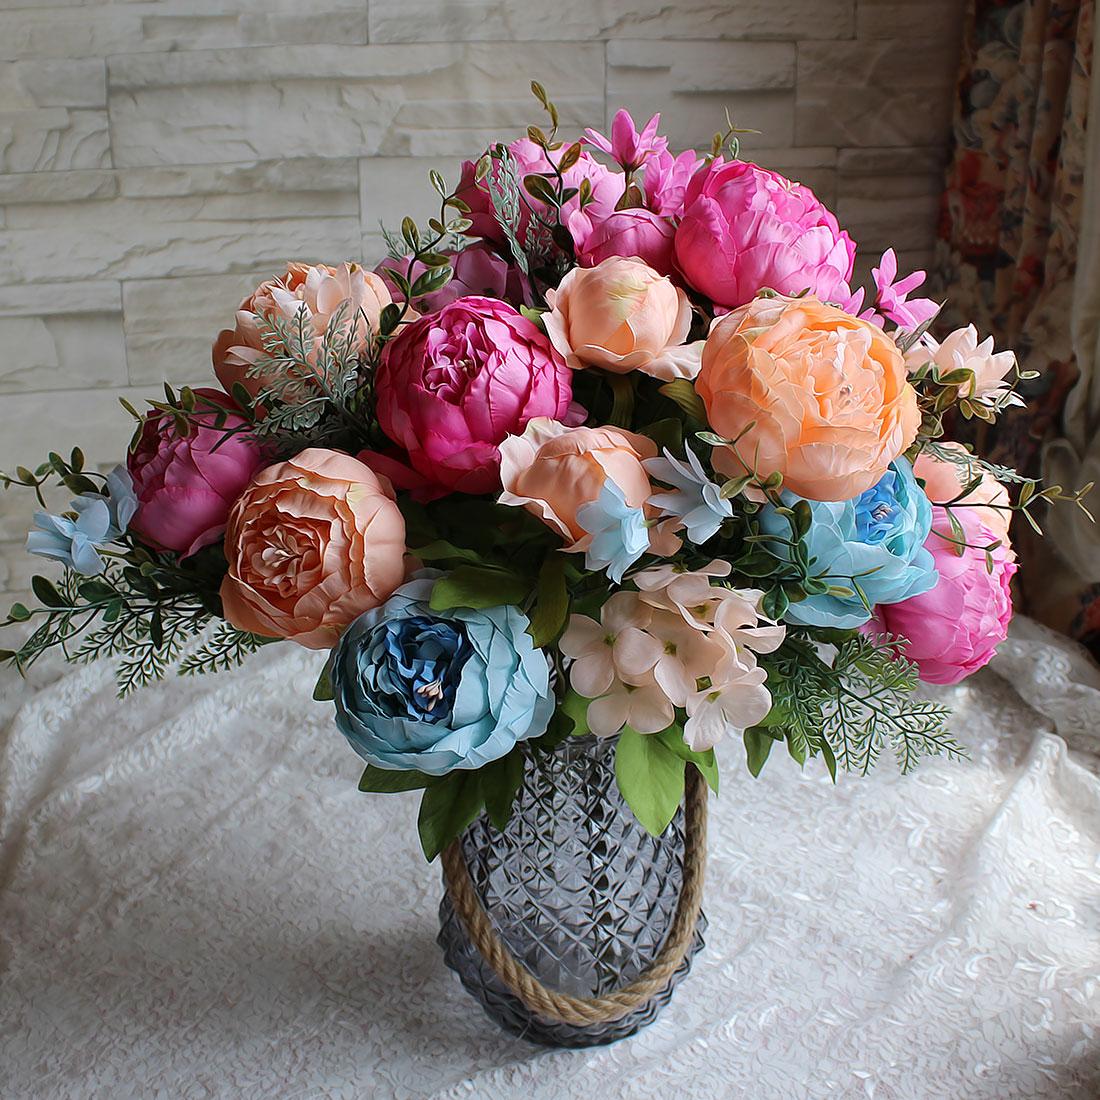 Flores de seda peonía Artificial Vintage europeo Flores falsas para decoración de boda Flores de peonía de seda para el hogar ramo Flores